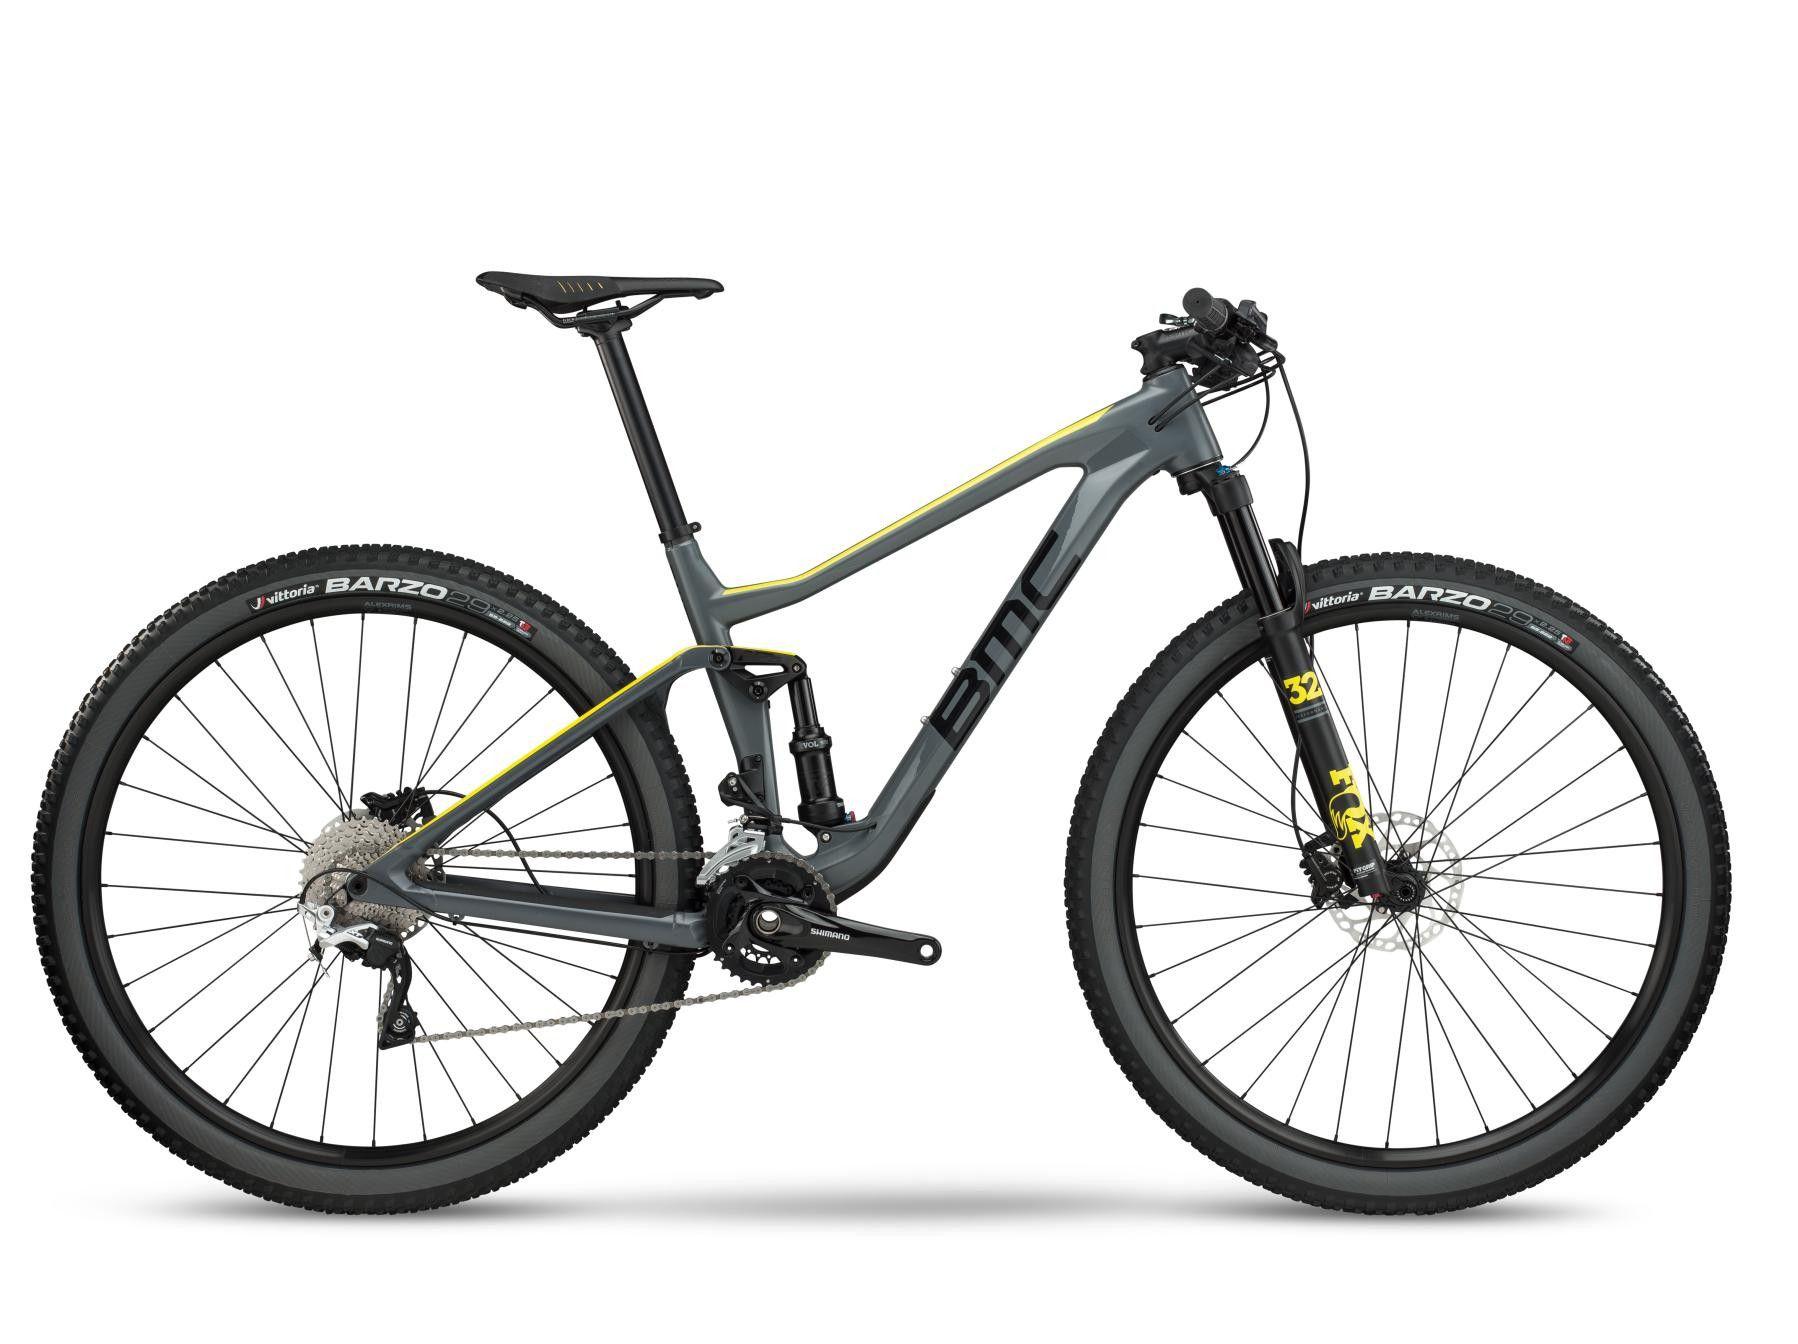 Bicicleta 29 Carbono Bmc Agonist 02 Deore / XT Aro 29 2018 Cinza e Verde